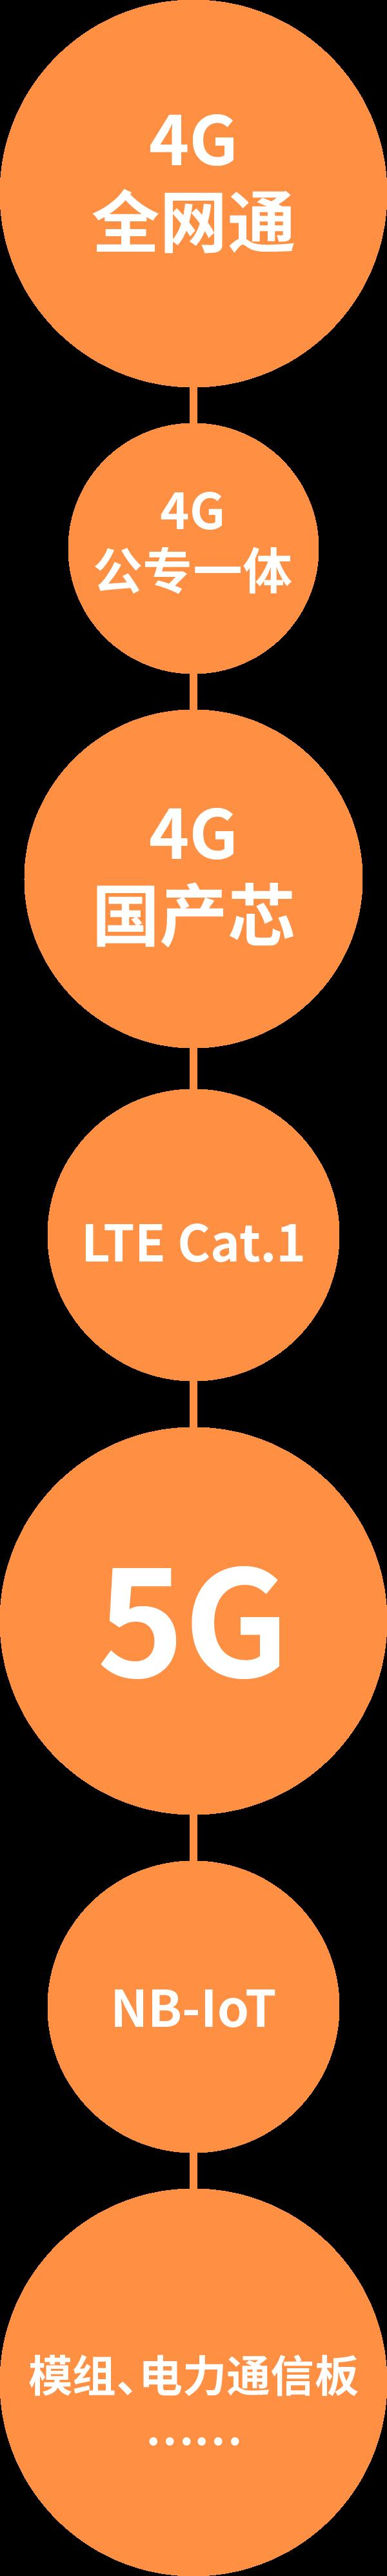 5G、4G、NB-IoT,高新兴电力物联网通信产品三箭齐发